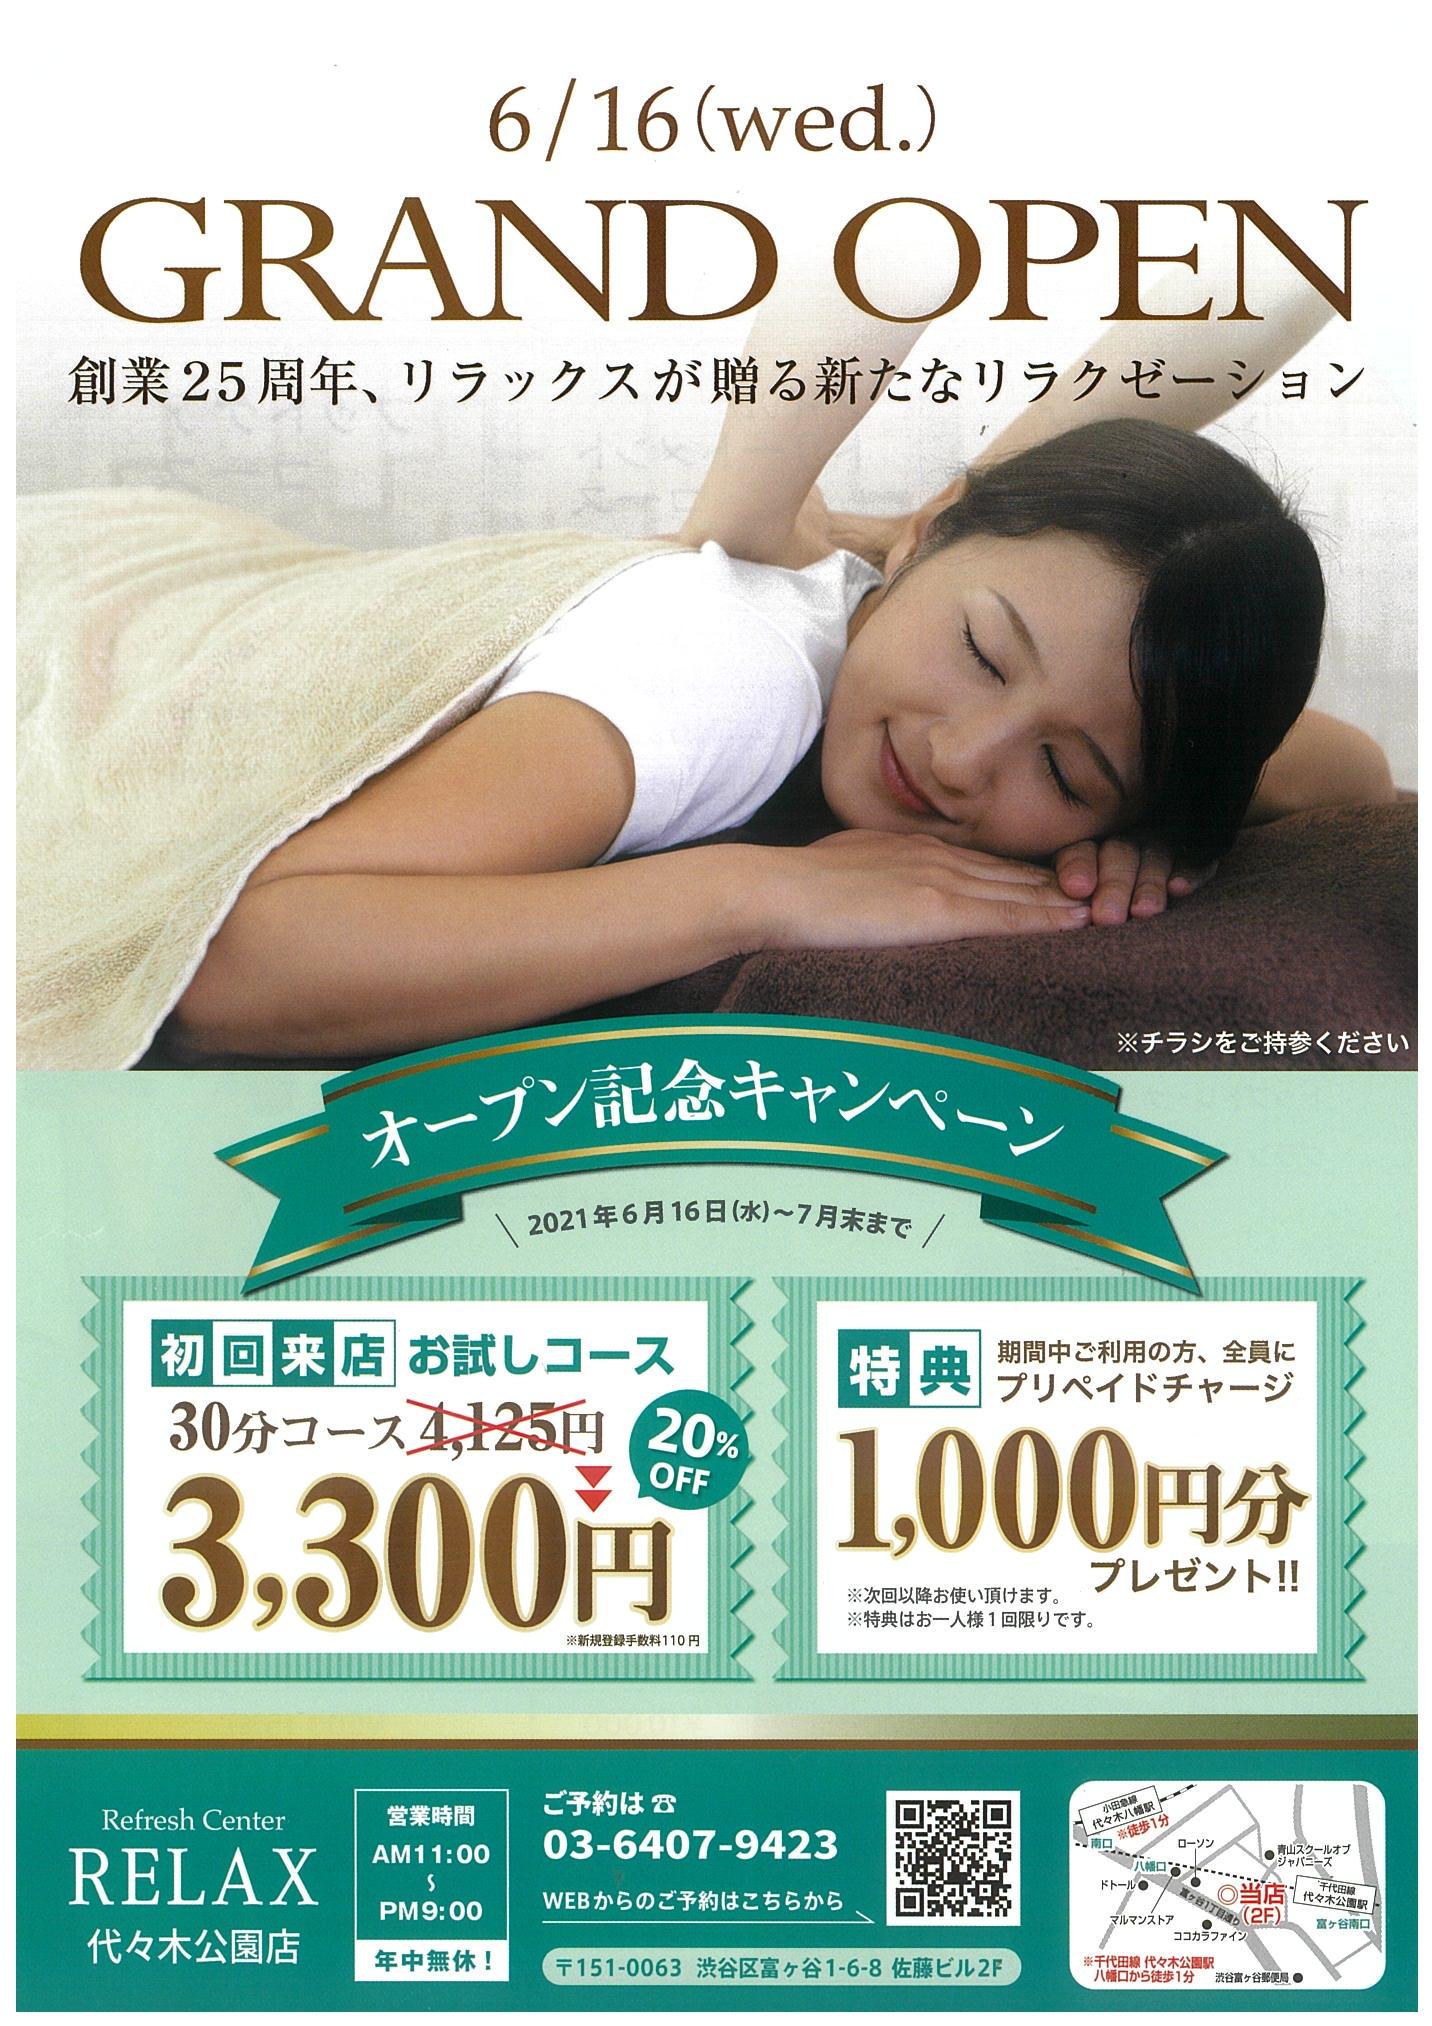 【HP限定情報】リラックス 代々木公園店OPEN! チラシ持参でOPEN記念価格!